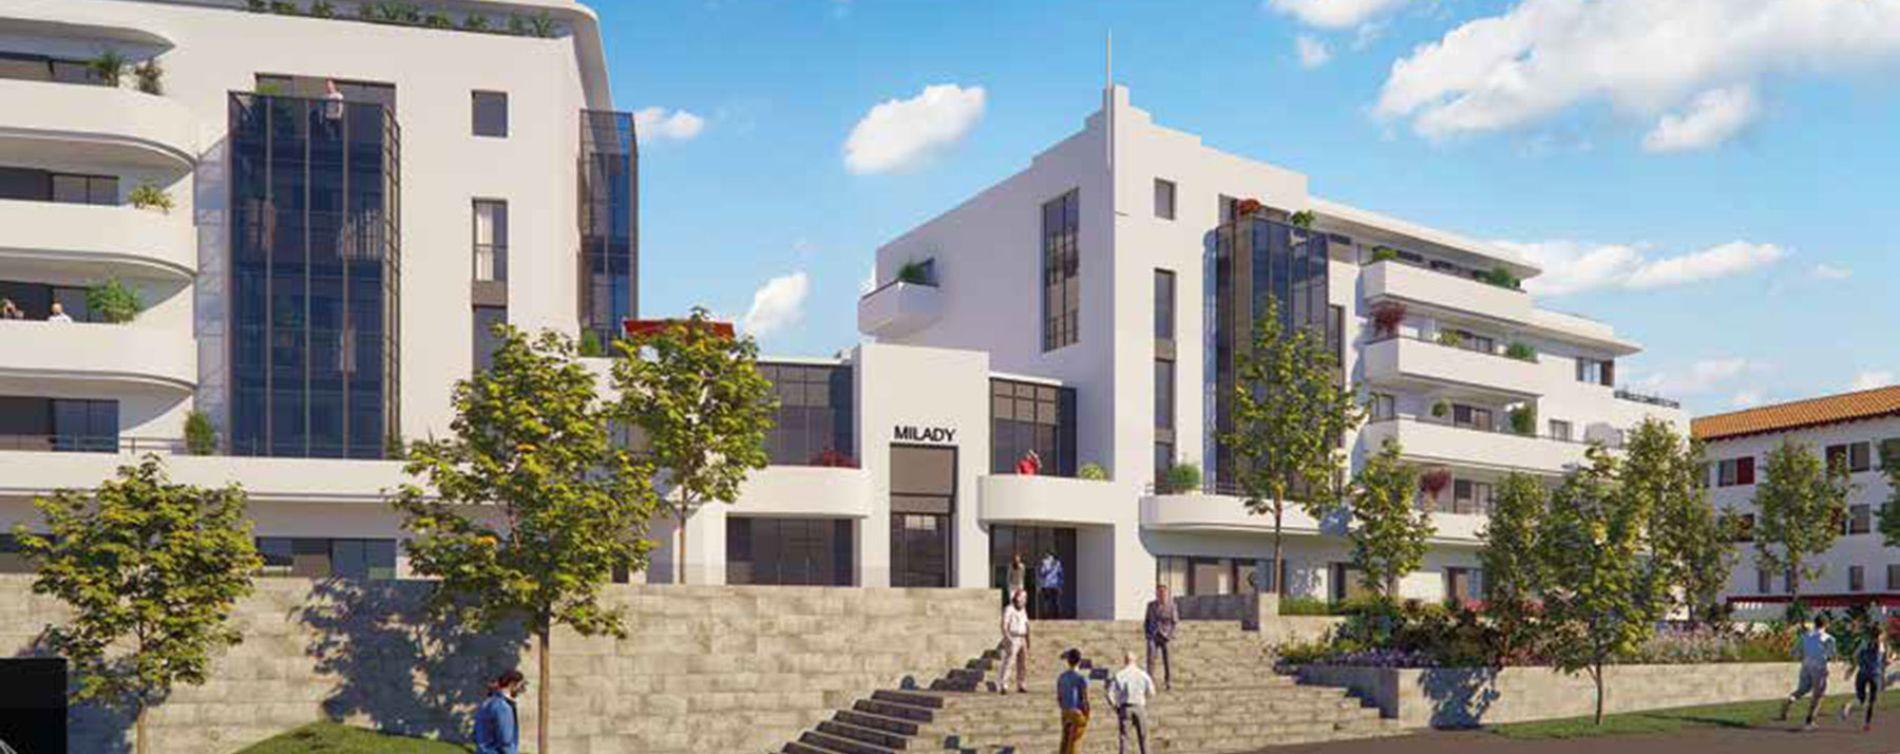 Biarritz : programme immobilier neuve « Programme immobilier n°217099 » (3)